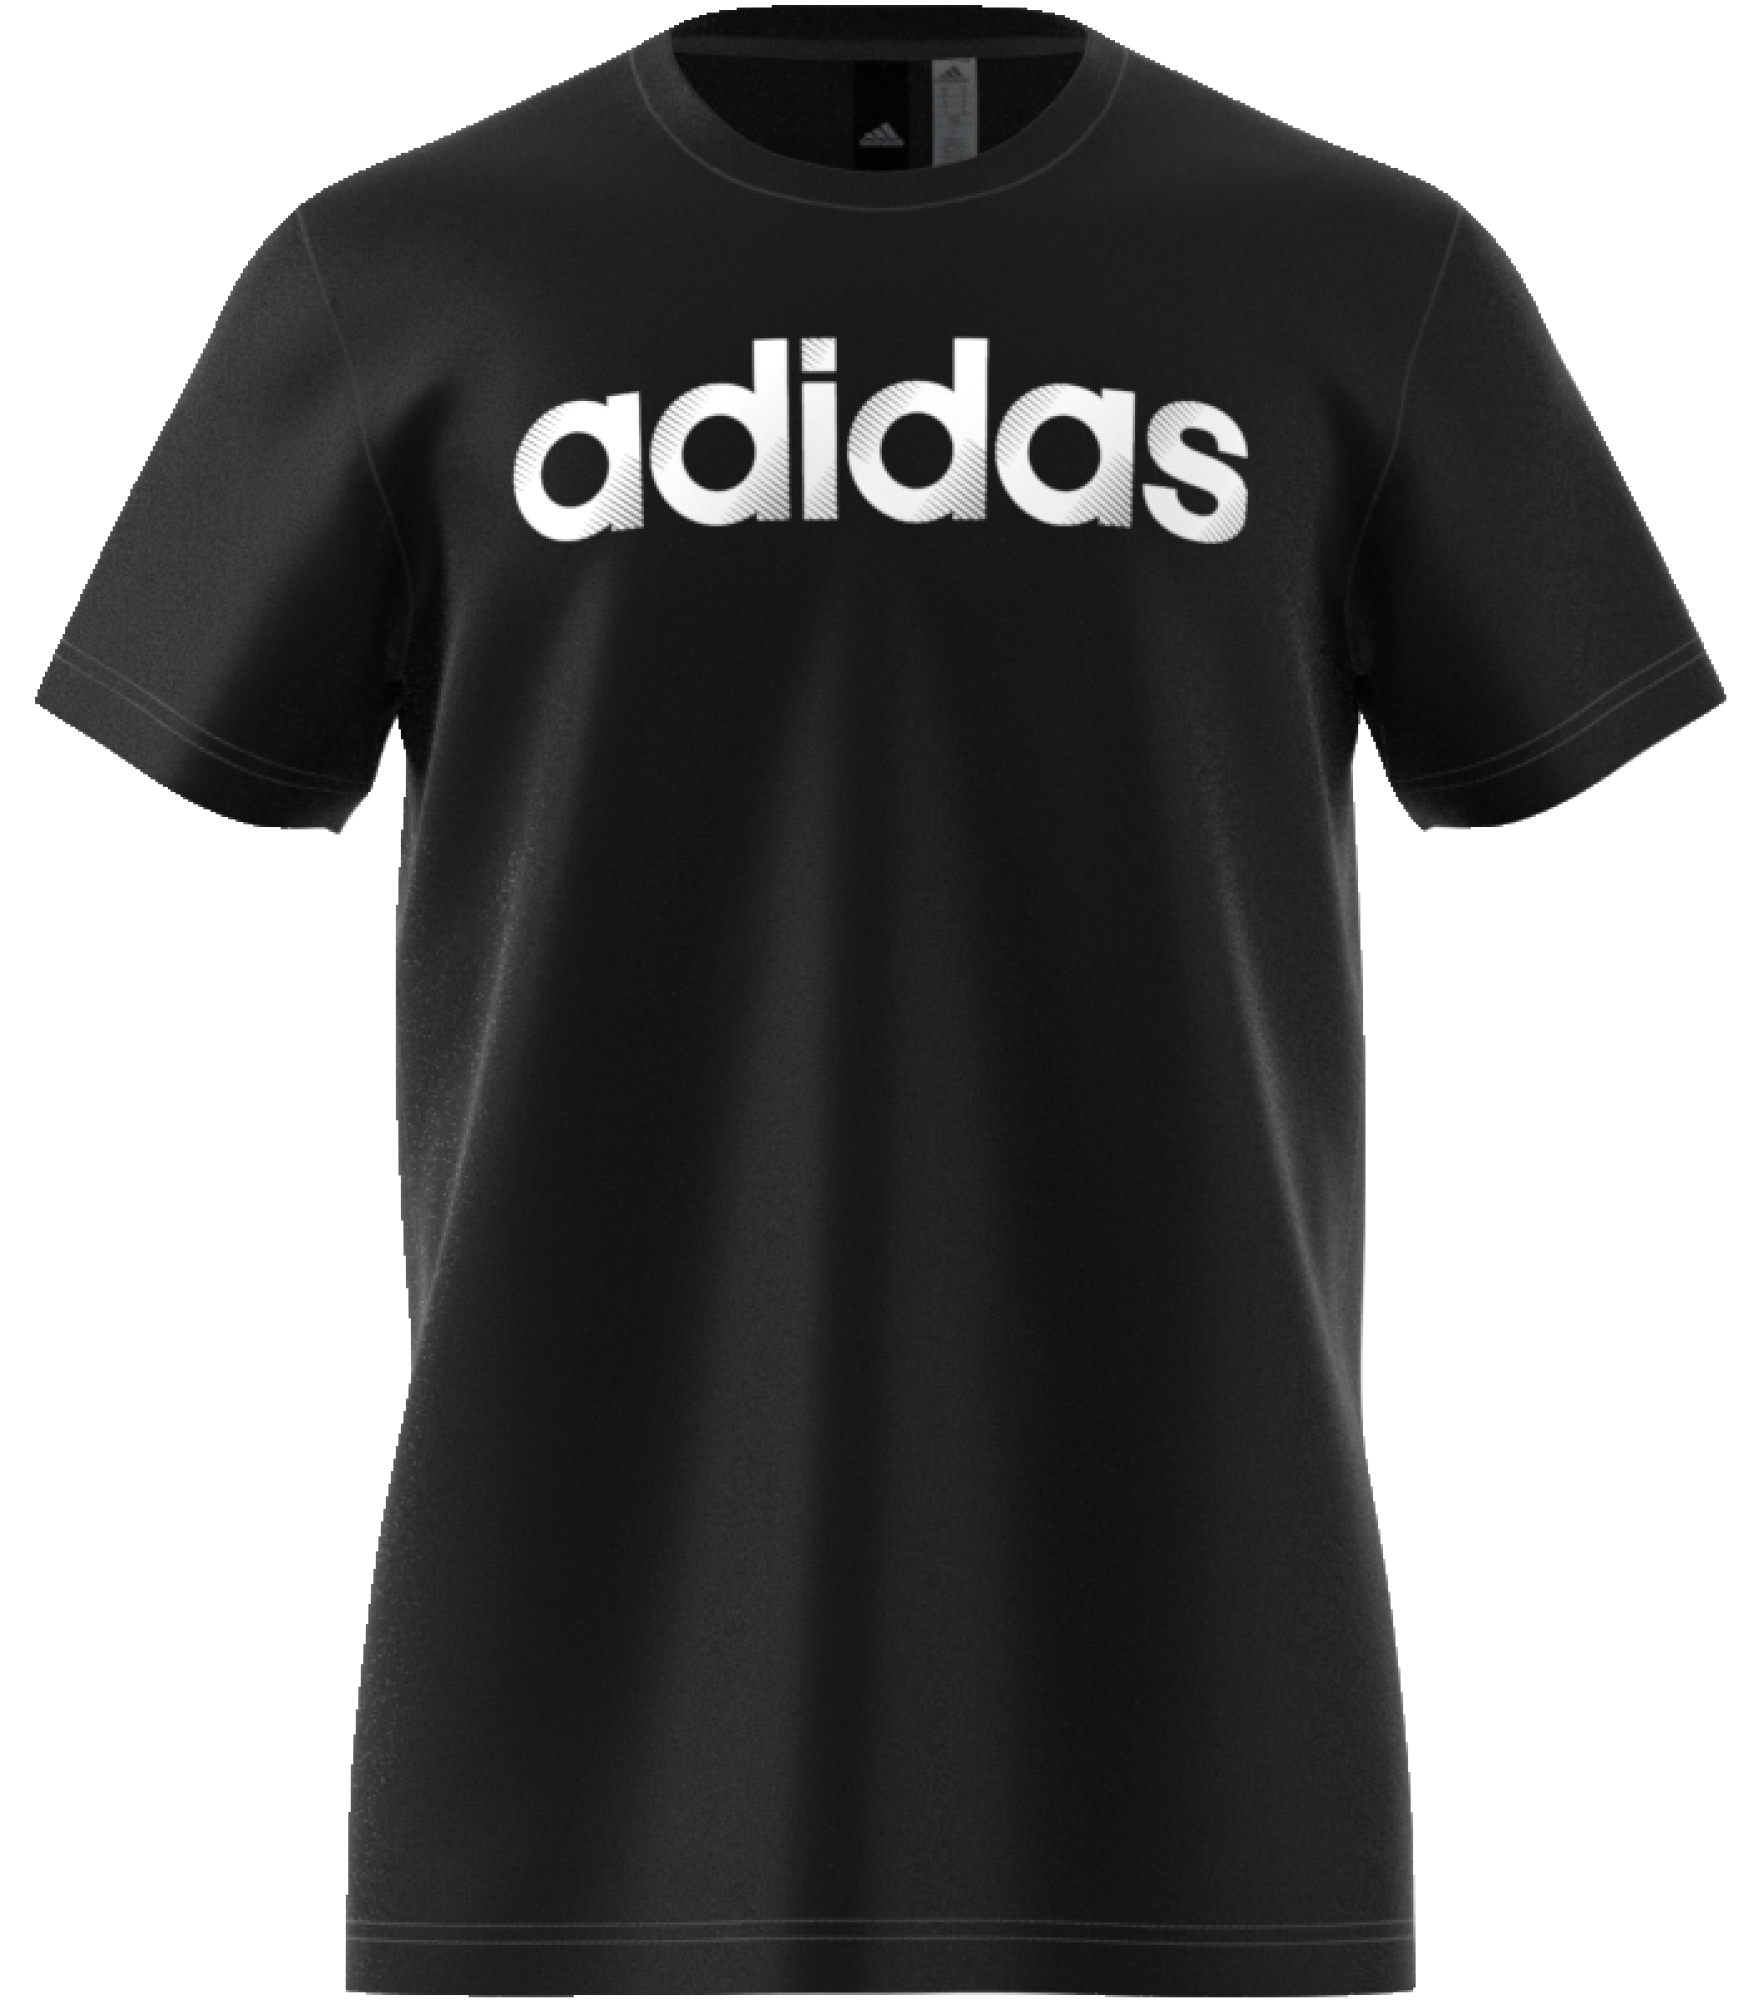 ADIDAS Sliced Linear miesten t-paita 728d3e7e5f